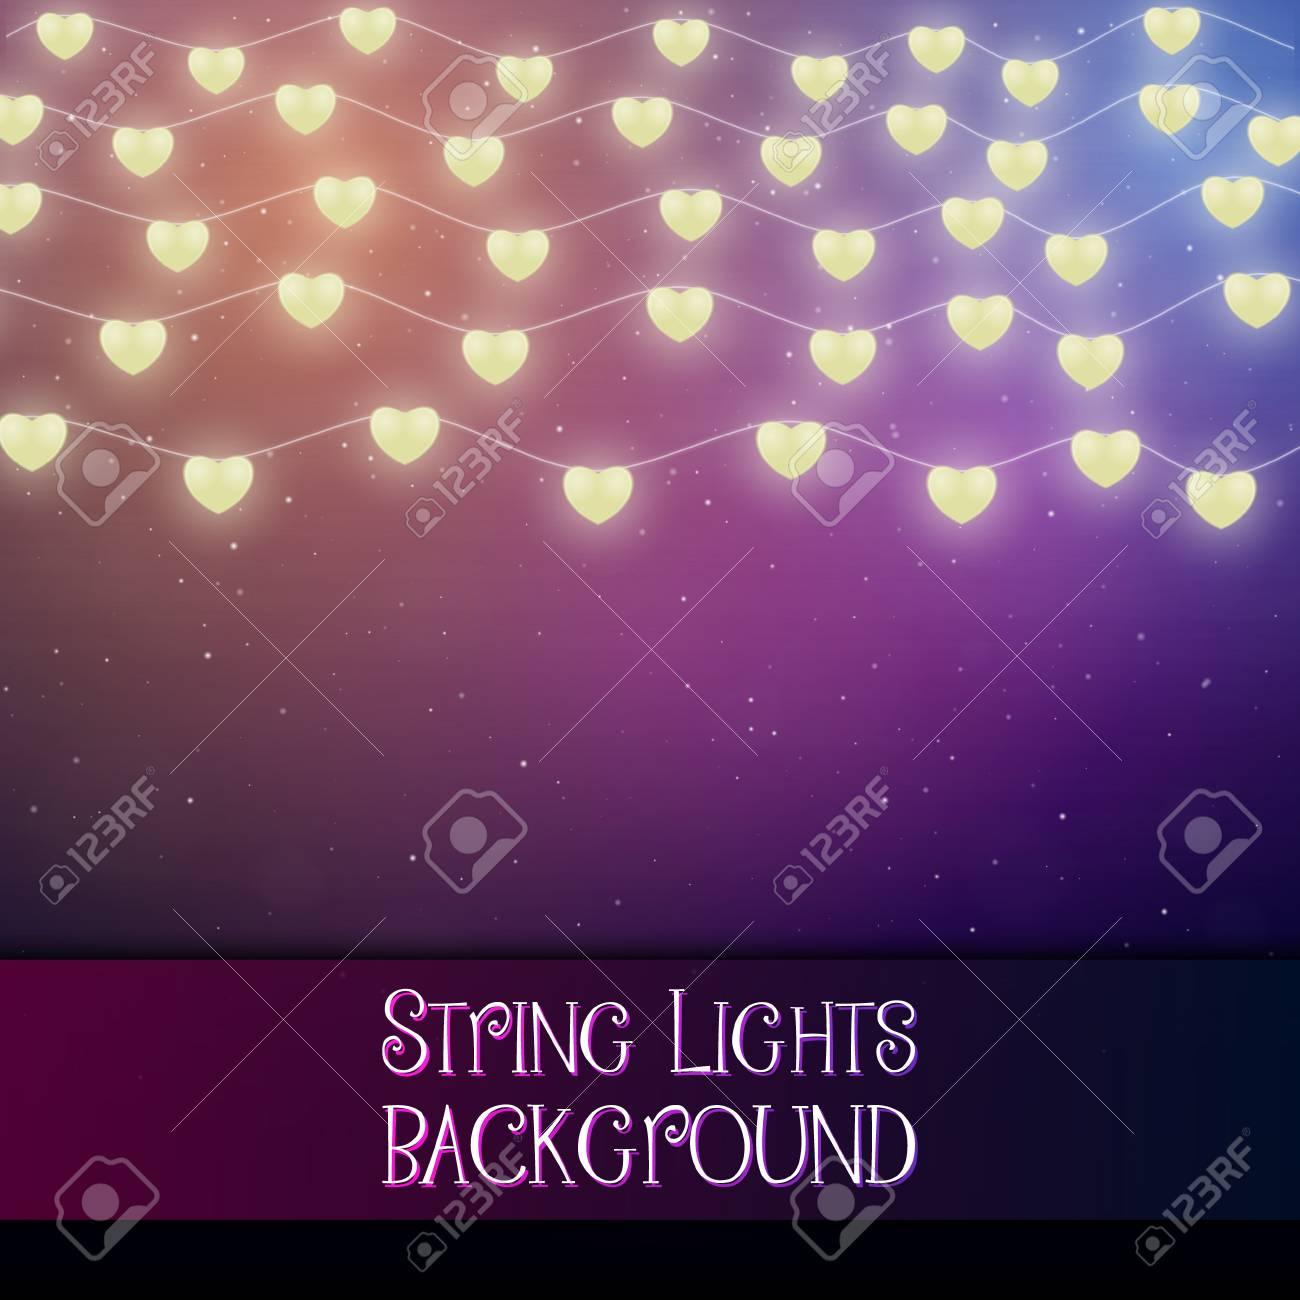 Dark background with decorative string lights. Bright shining light bulbs garlands - 114806868